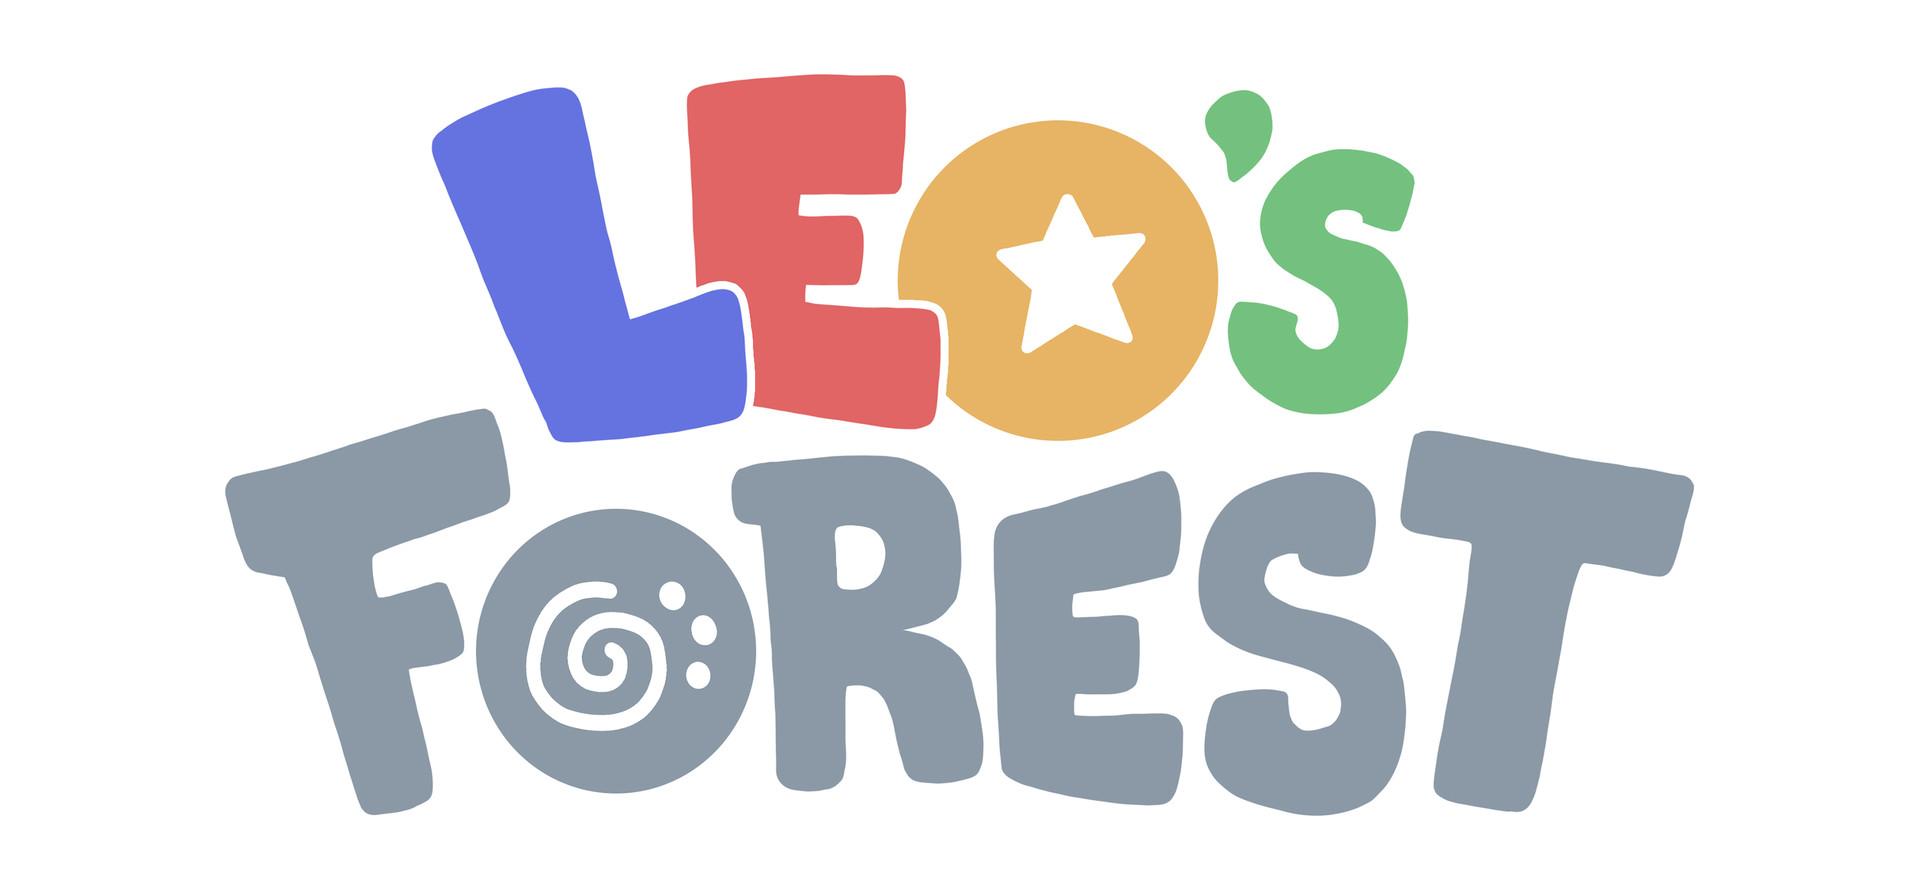 Luigi lucarelli leo s forest logo